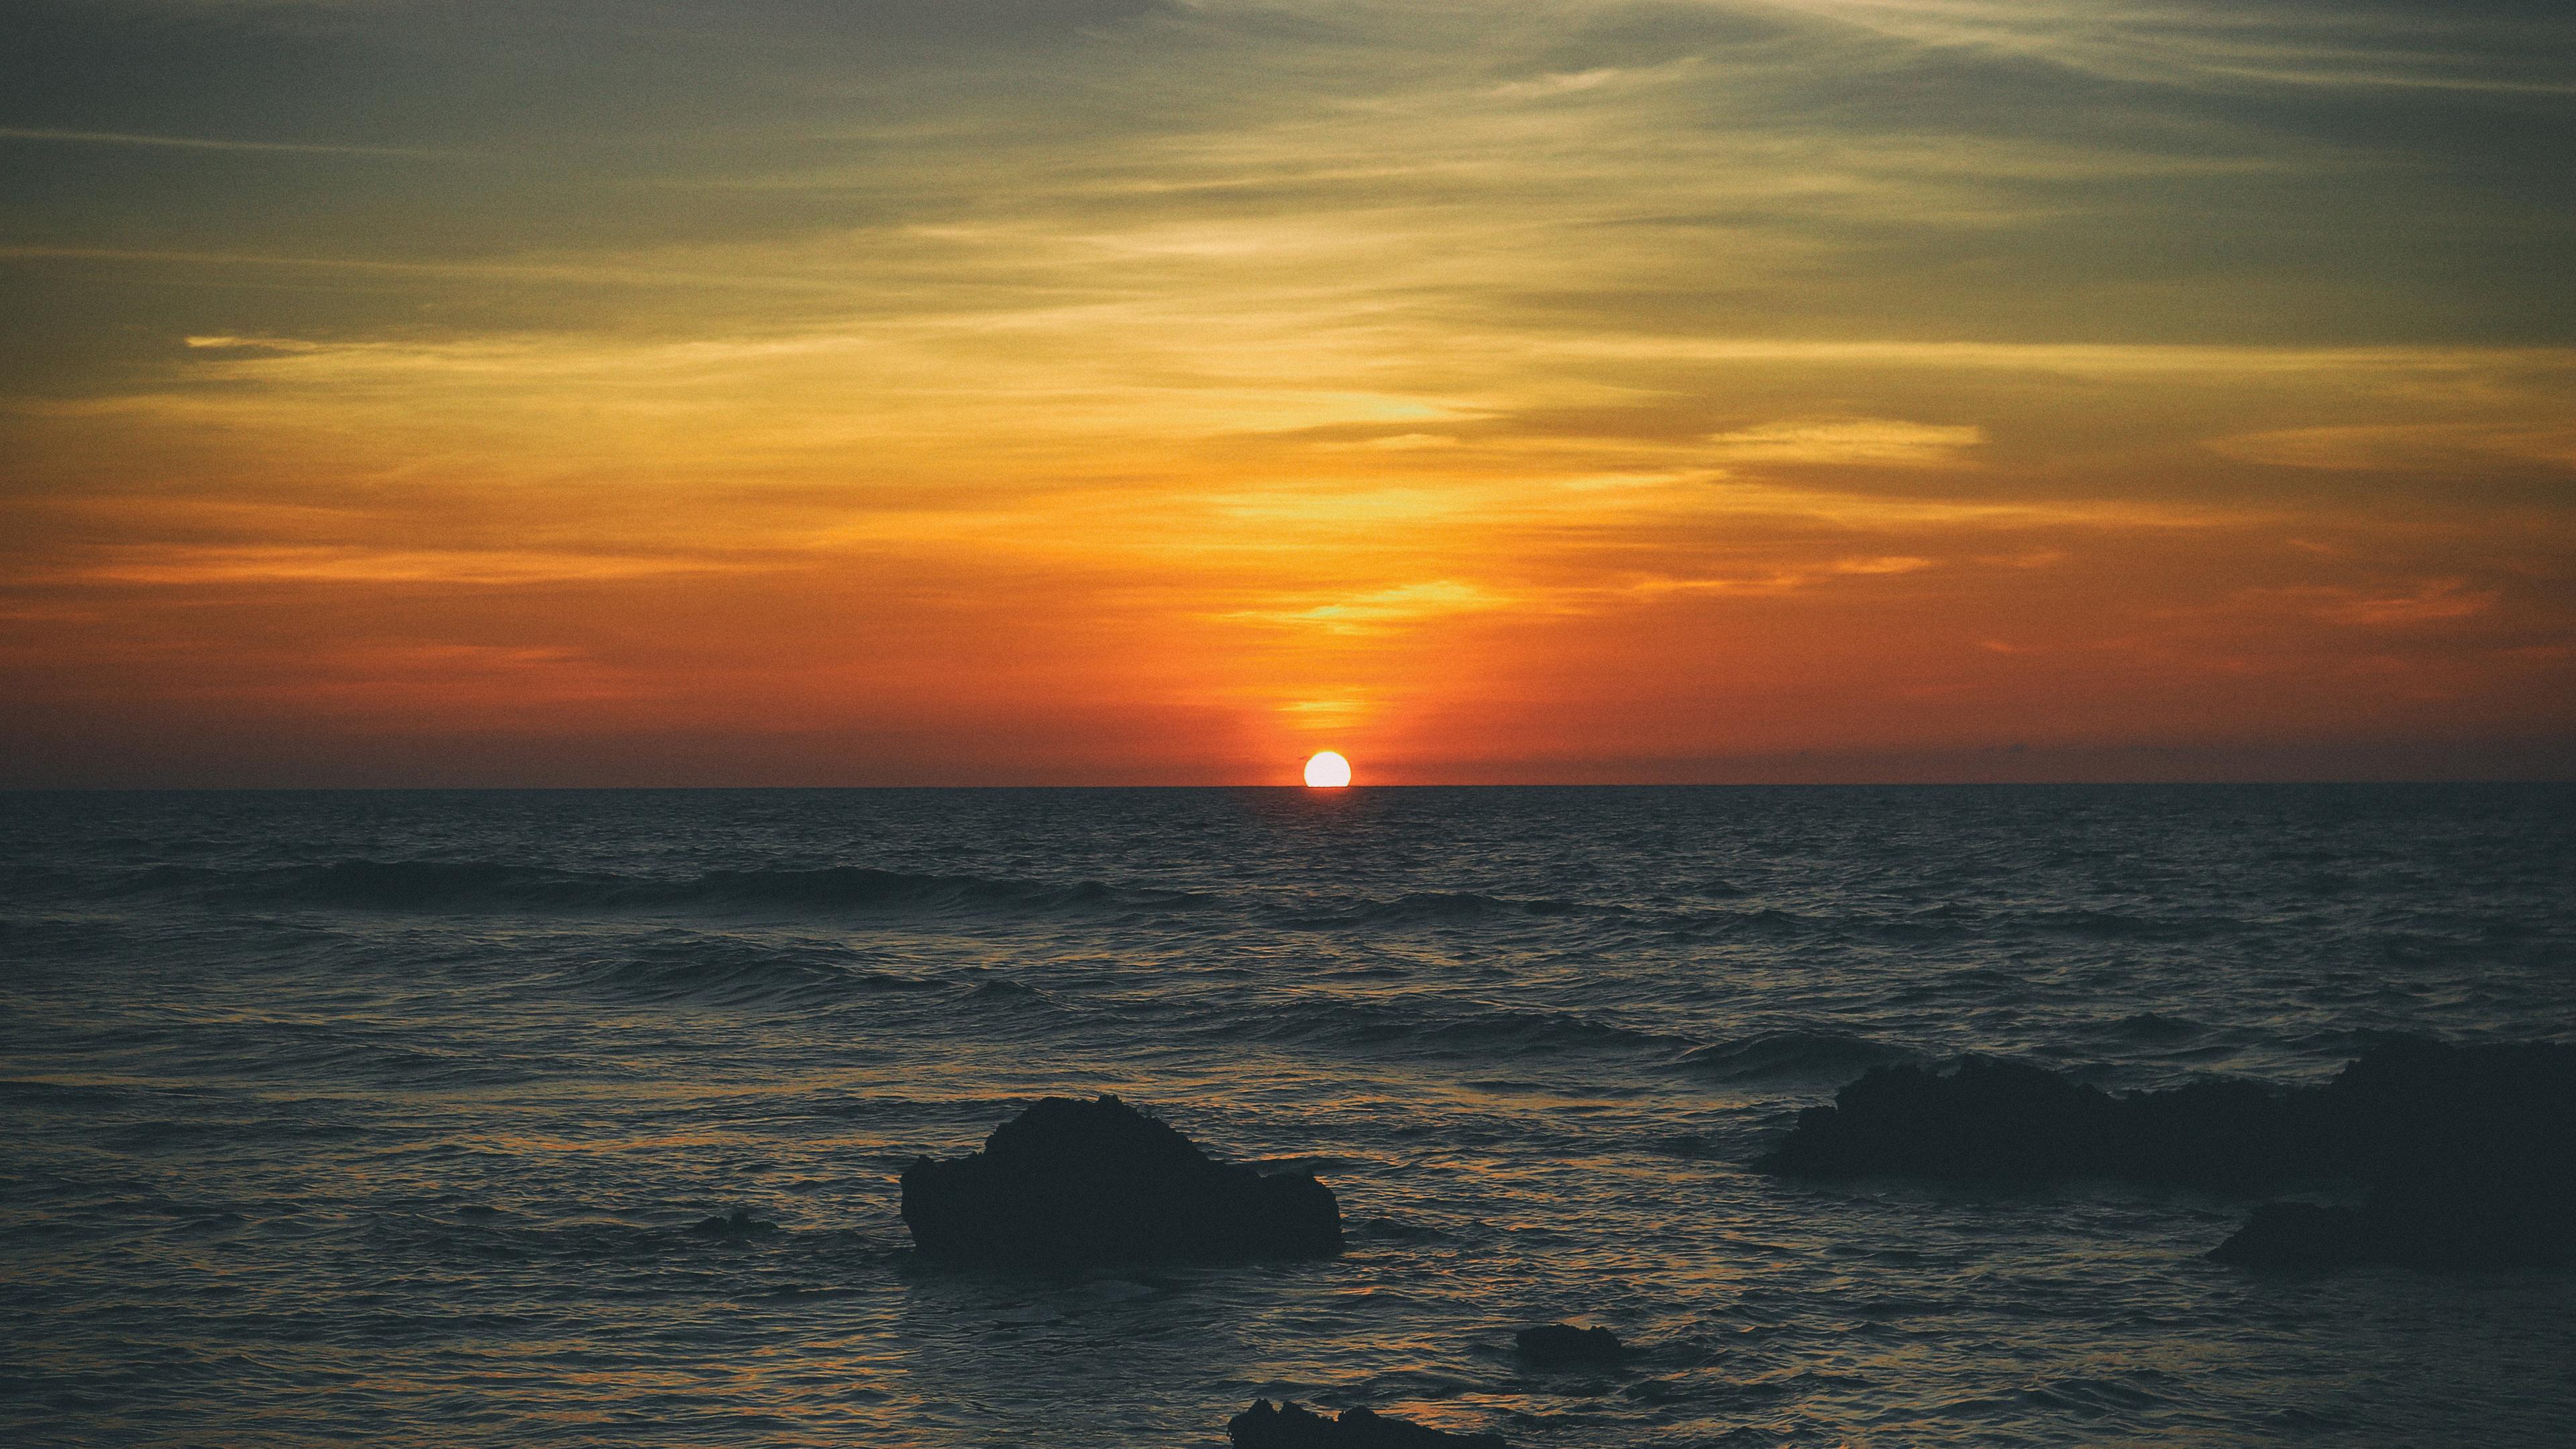 beach sunset sea sunrise 5k 1540136635 - Beach Sunset Sea Sunrise 5k - sunset wallpapers, sunrise wallpapers, sea wallpapers, nature wallpapers, hd-wallpapers, beach wallpapers, 5k wallpapers, 4k-wallpapers